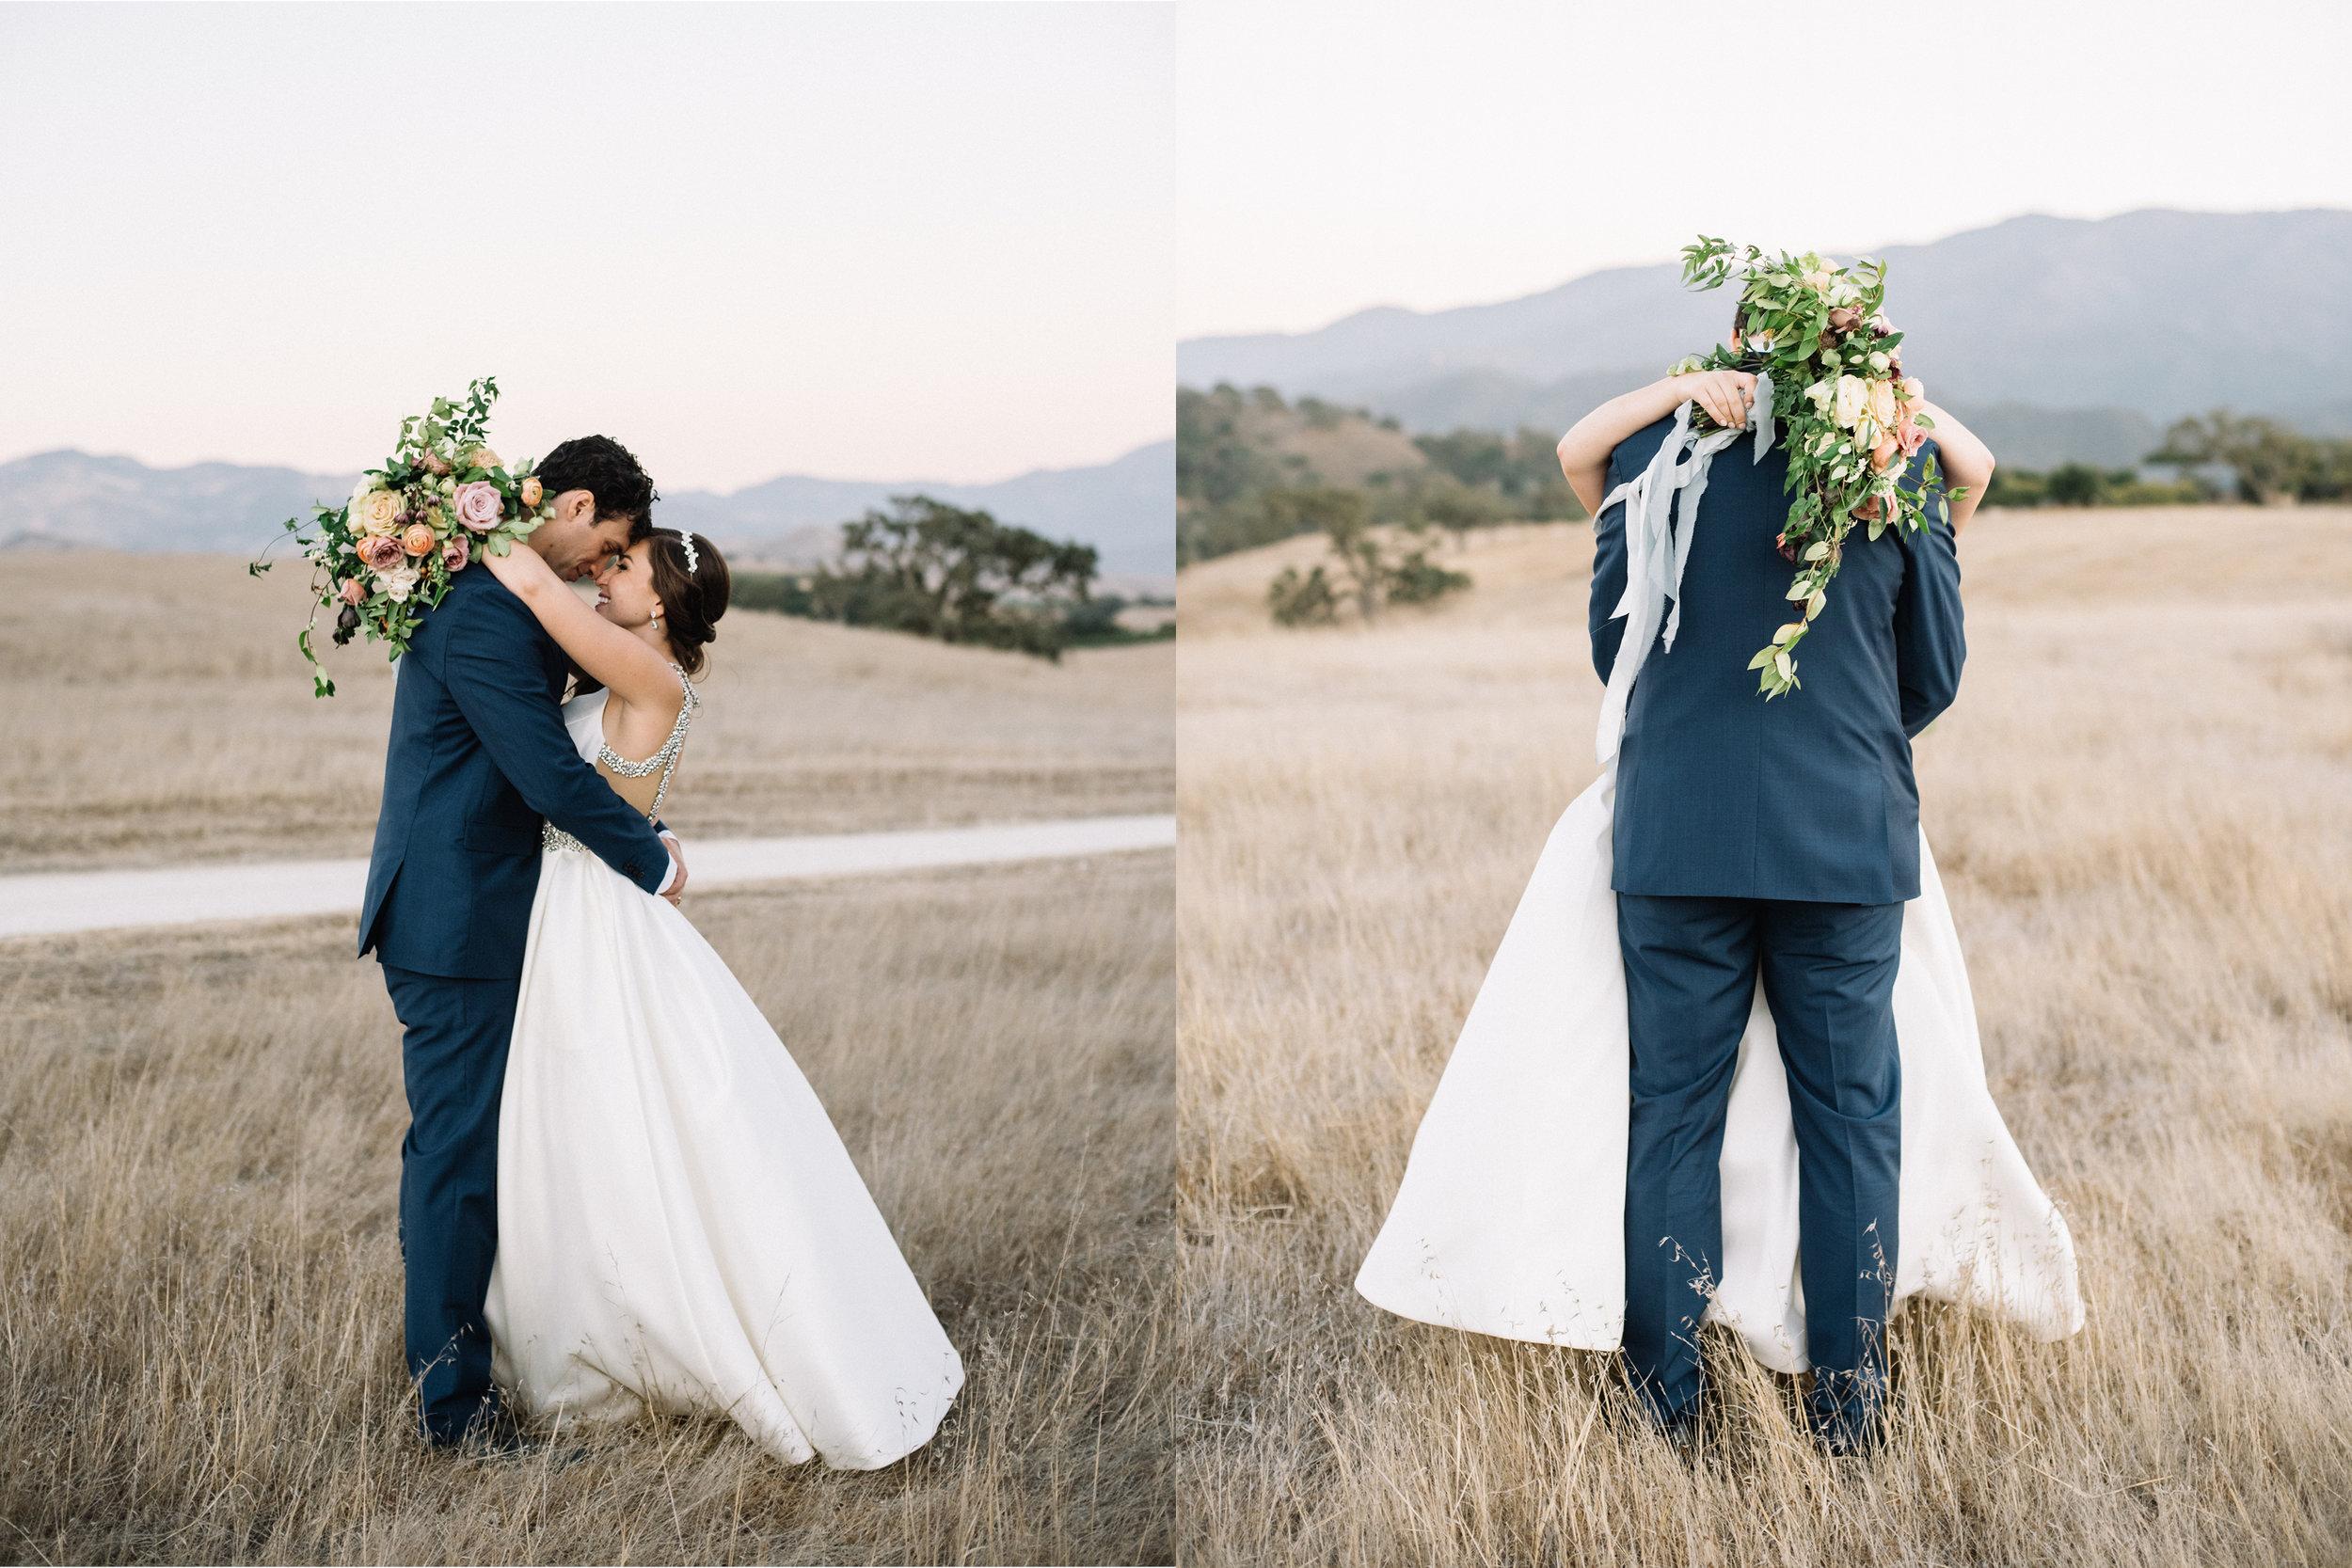 santa-barbara-elopement-elope-wedding-planner-planning-coordinator-day-of-intimate-event-design-kestrel-park-santa-ynez-english-country-estate-garden-castle (21).jpg